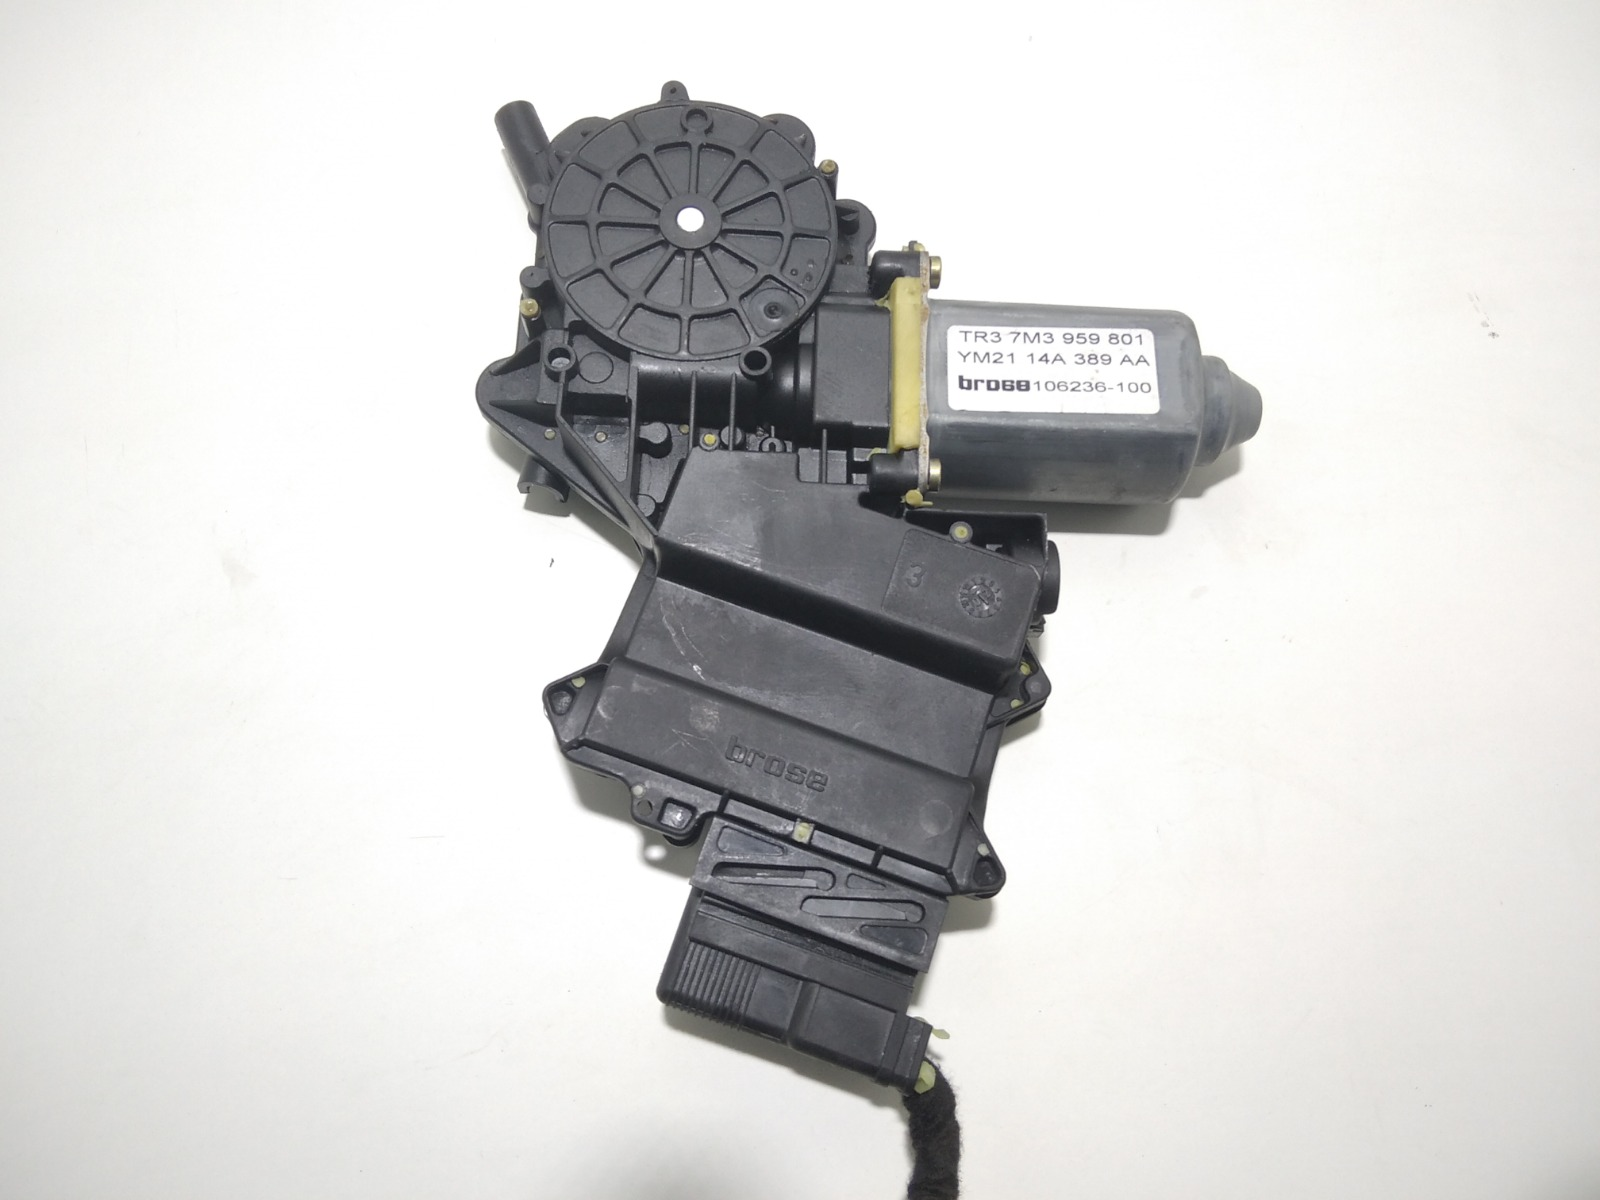 Моторчик стеклоподъемника передний левый Seat Alhambra 1.9 TDI 2002 (б/у)